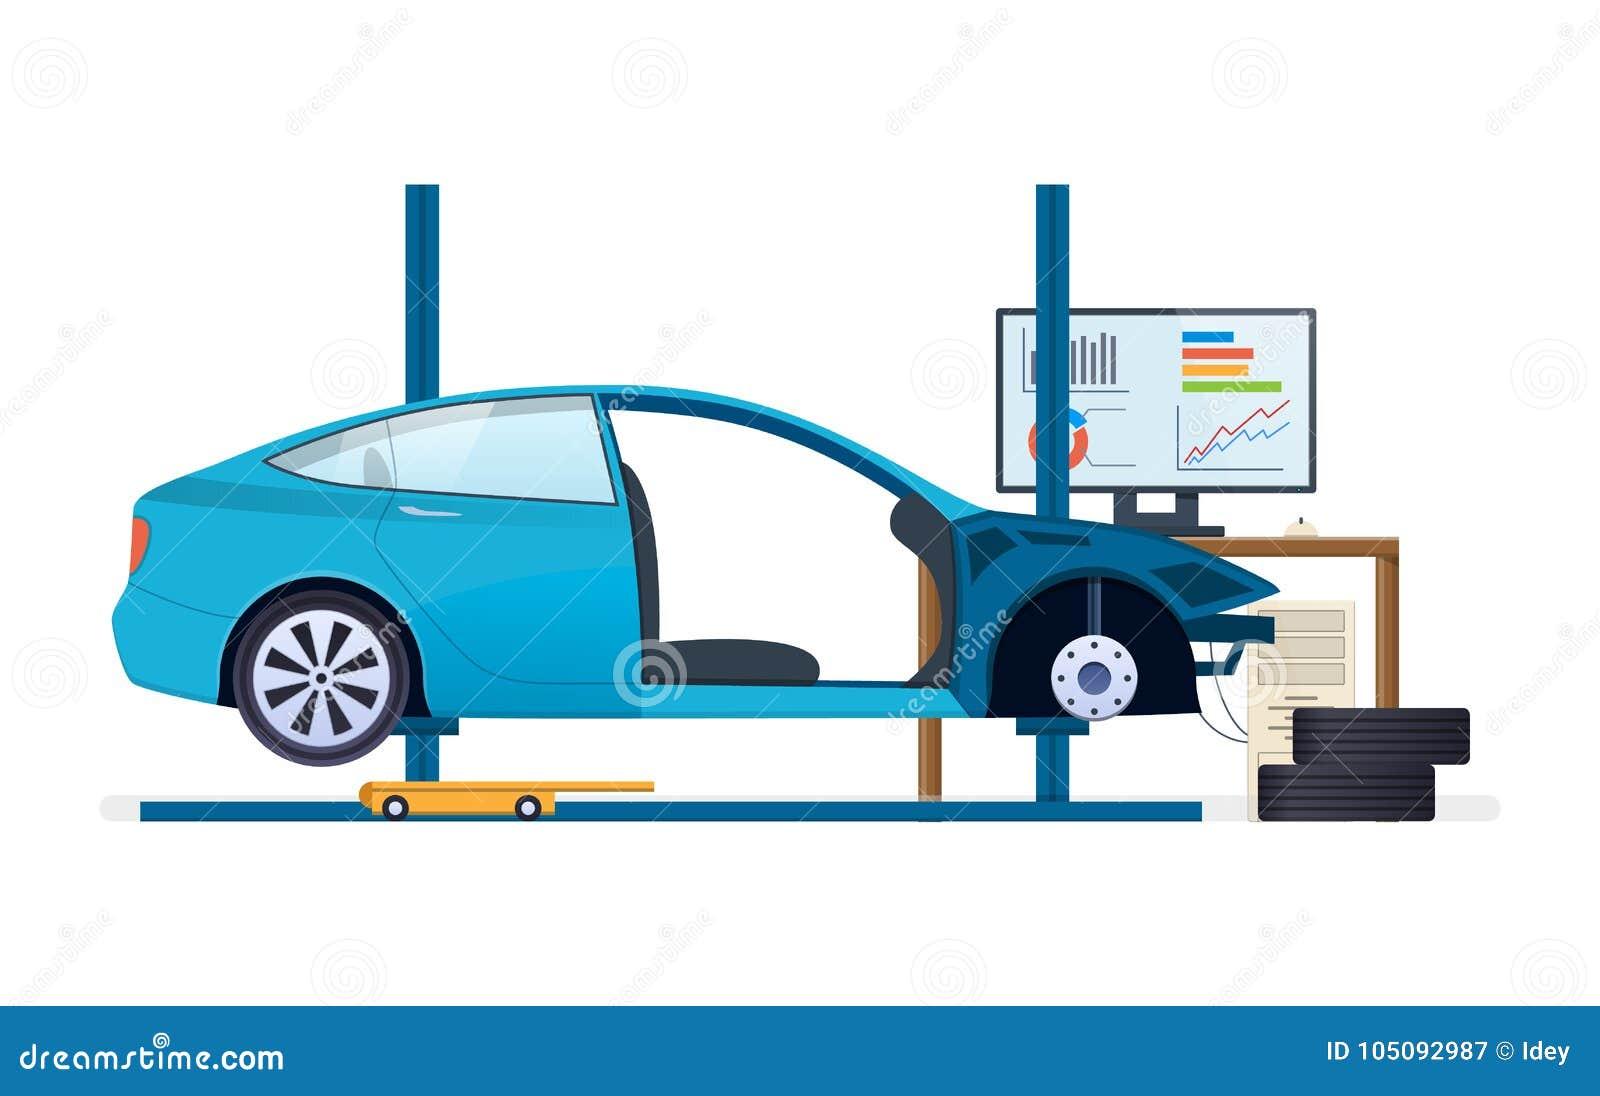 Car Repair Car Service Replacement Of Tires Wheels Car Parts